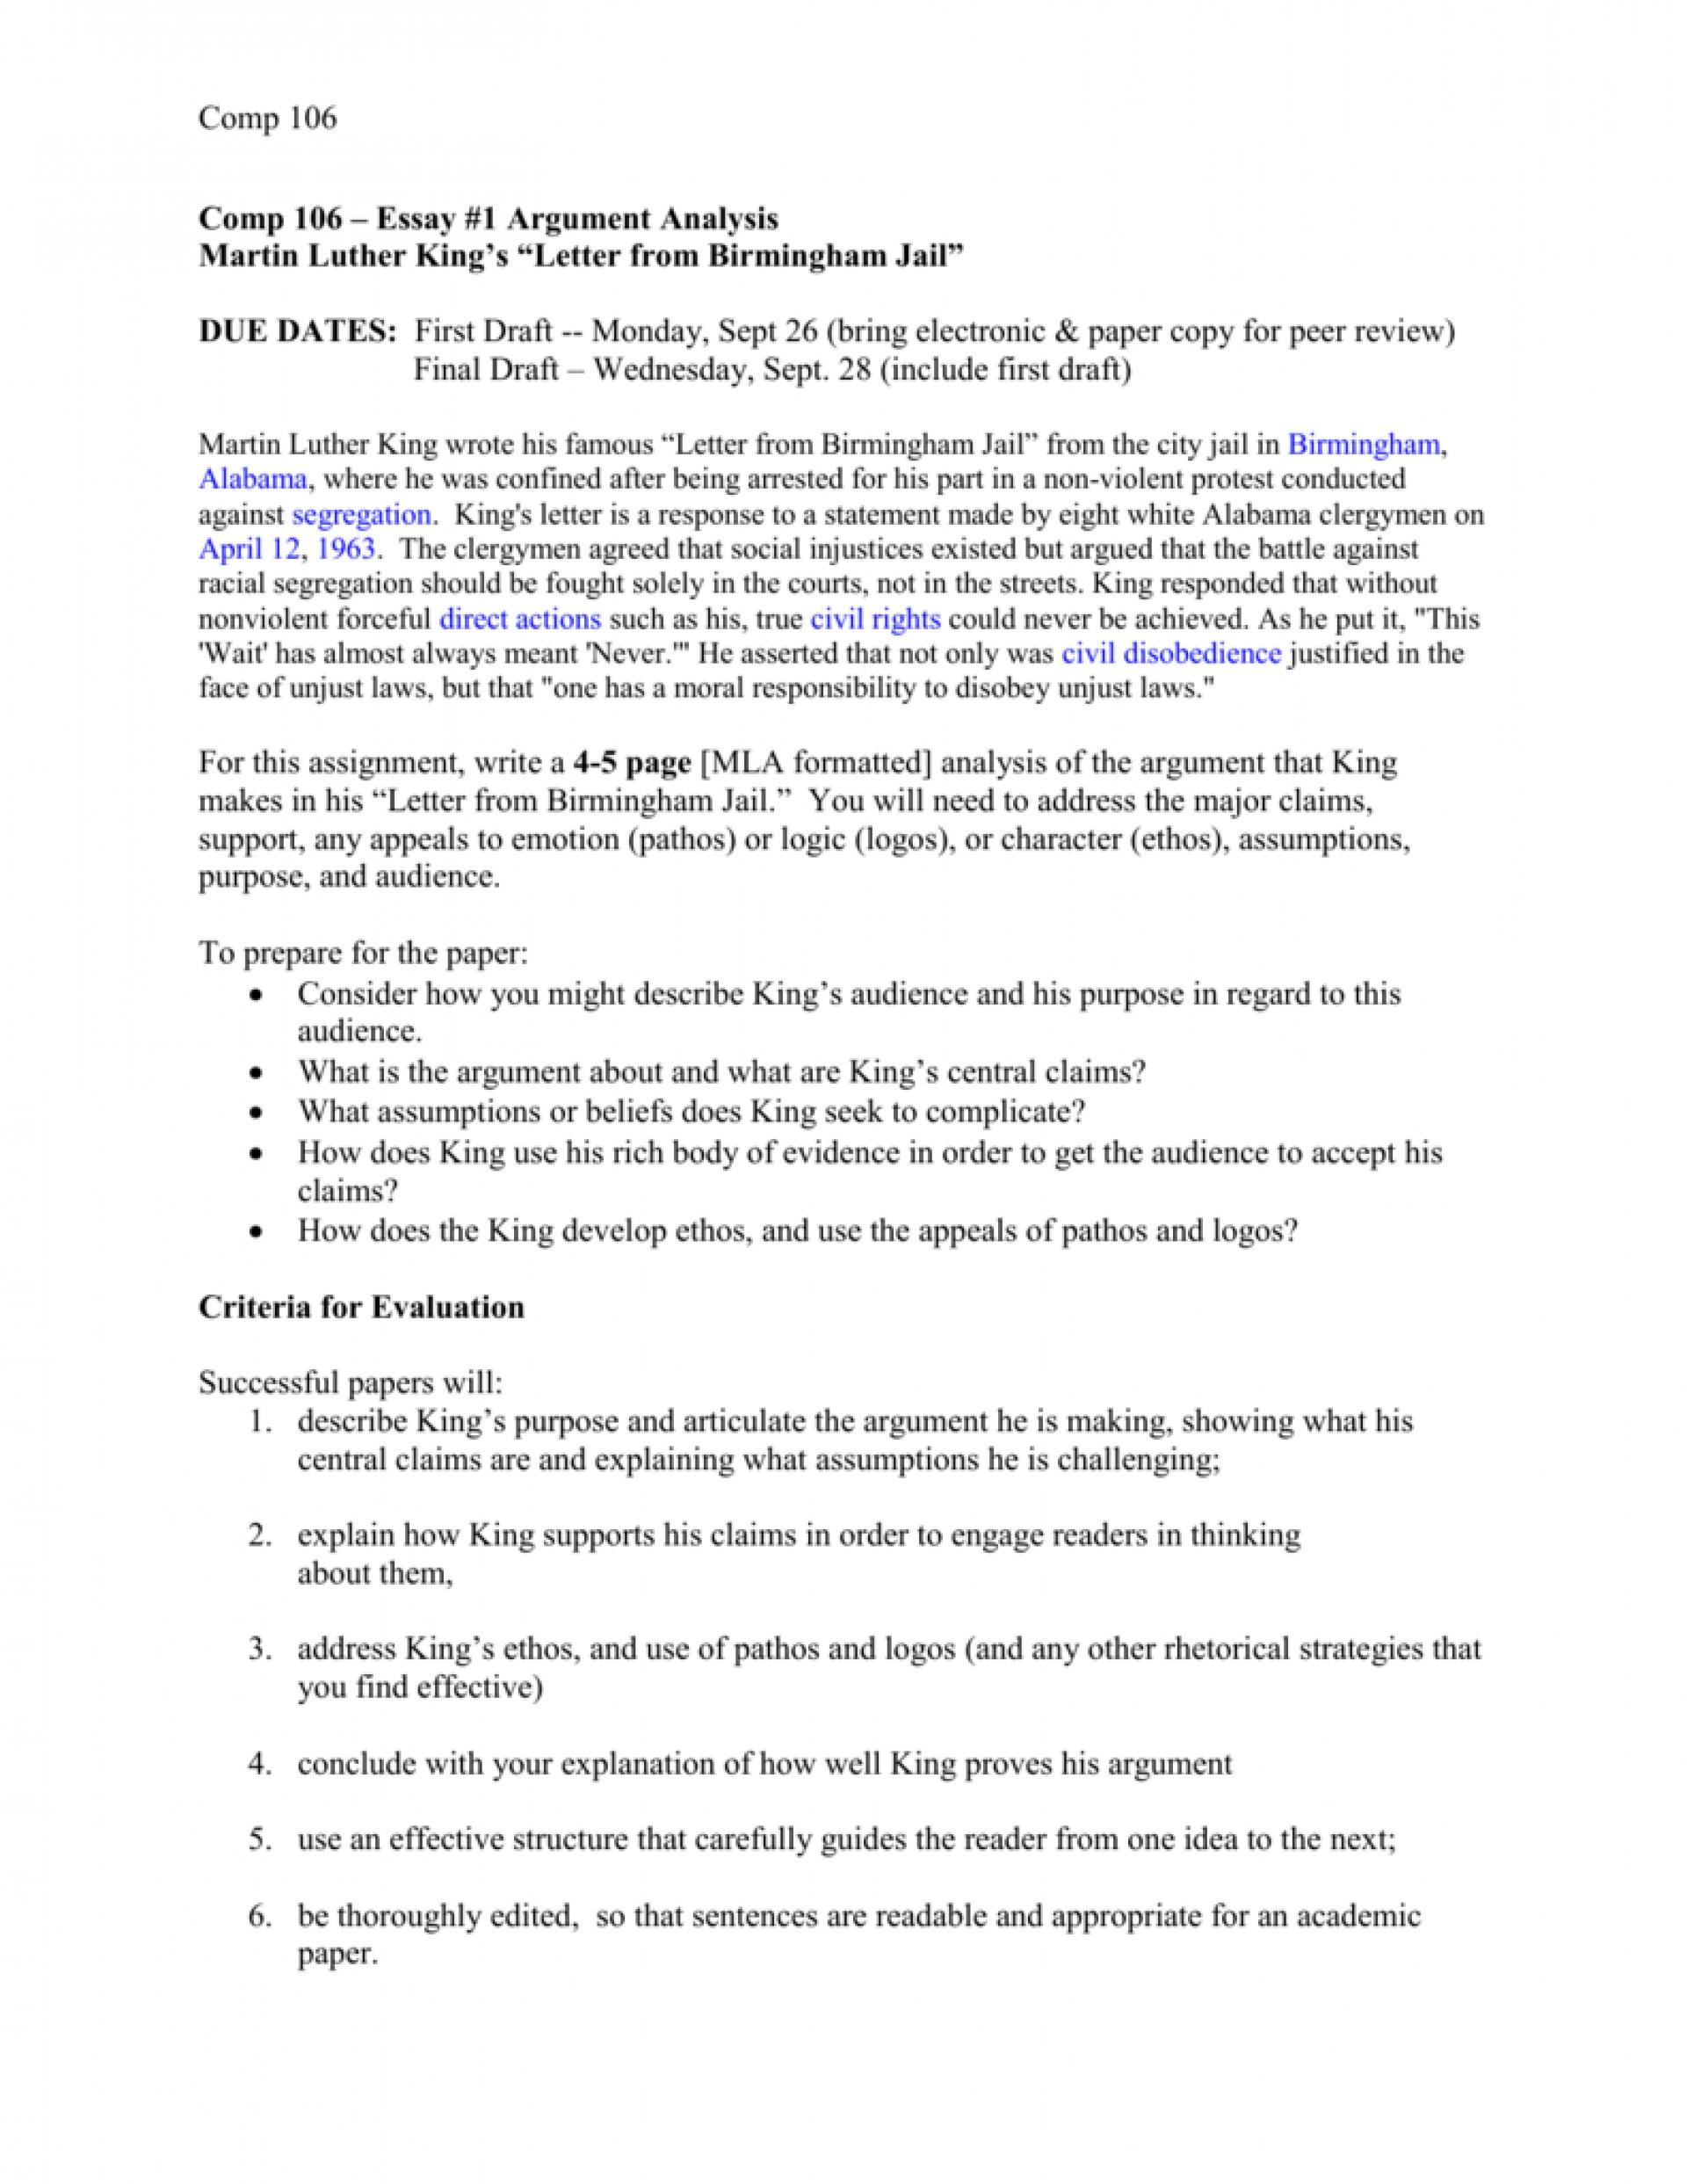 001 Letter From Birmingham Jail Ethos Pathos Logos Essay Example 008006798 1 Top 1920